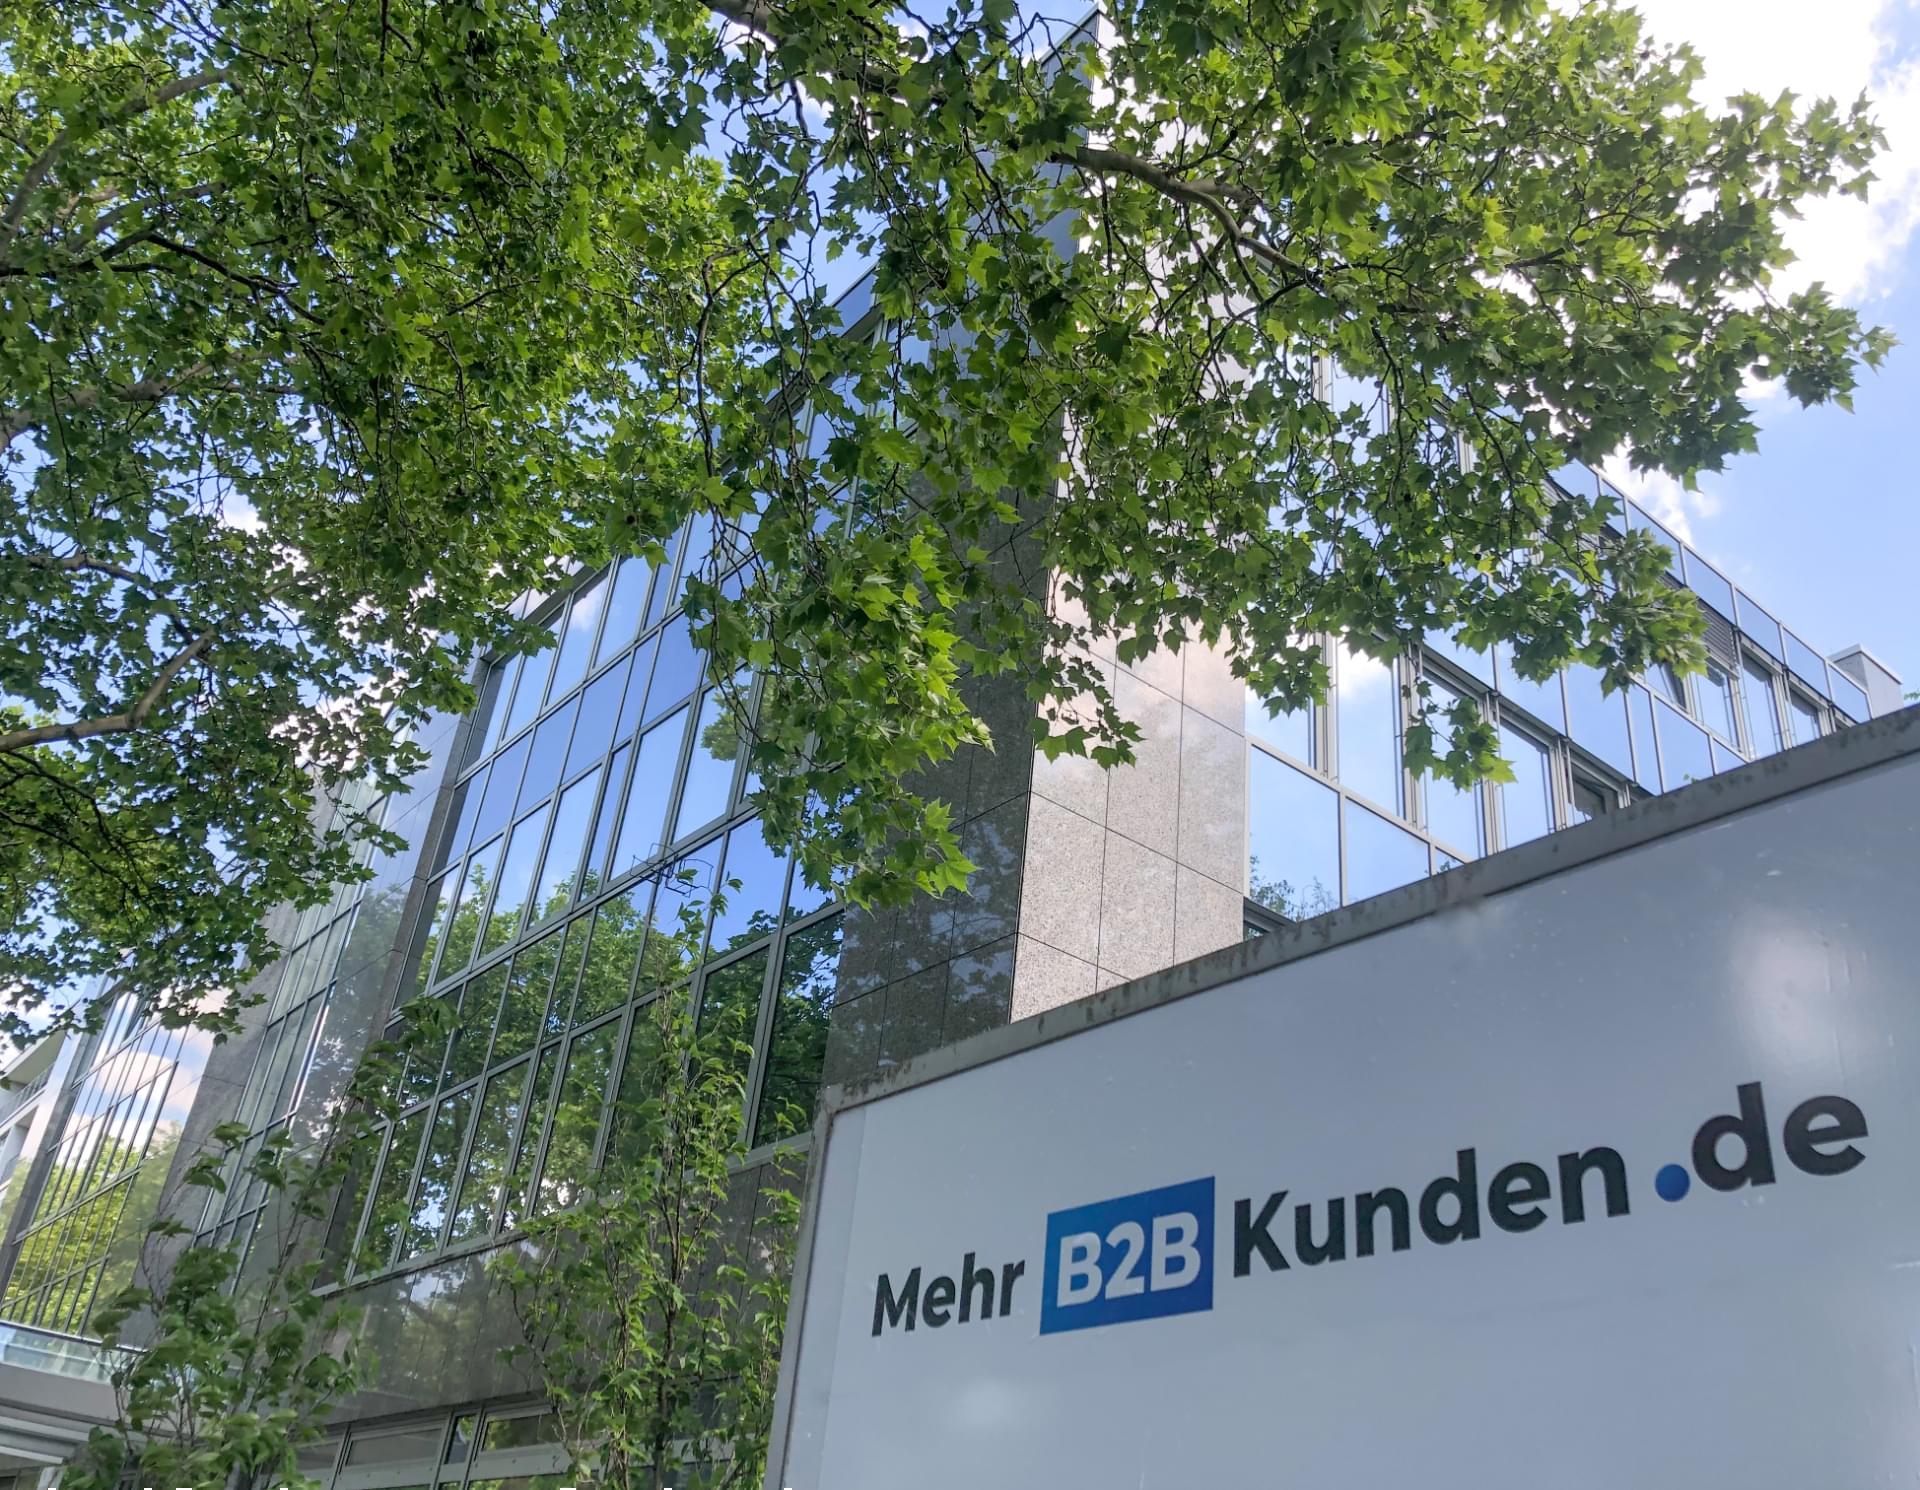 MehrB2BKunden.de Standort in Köln